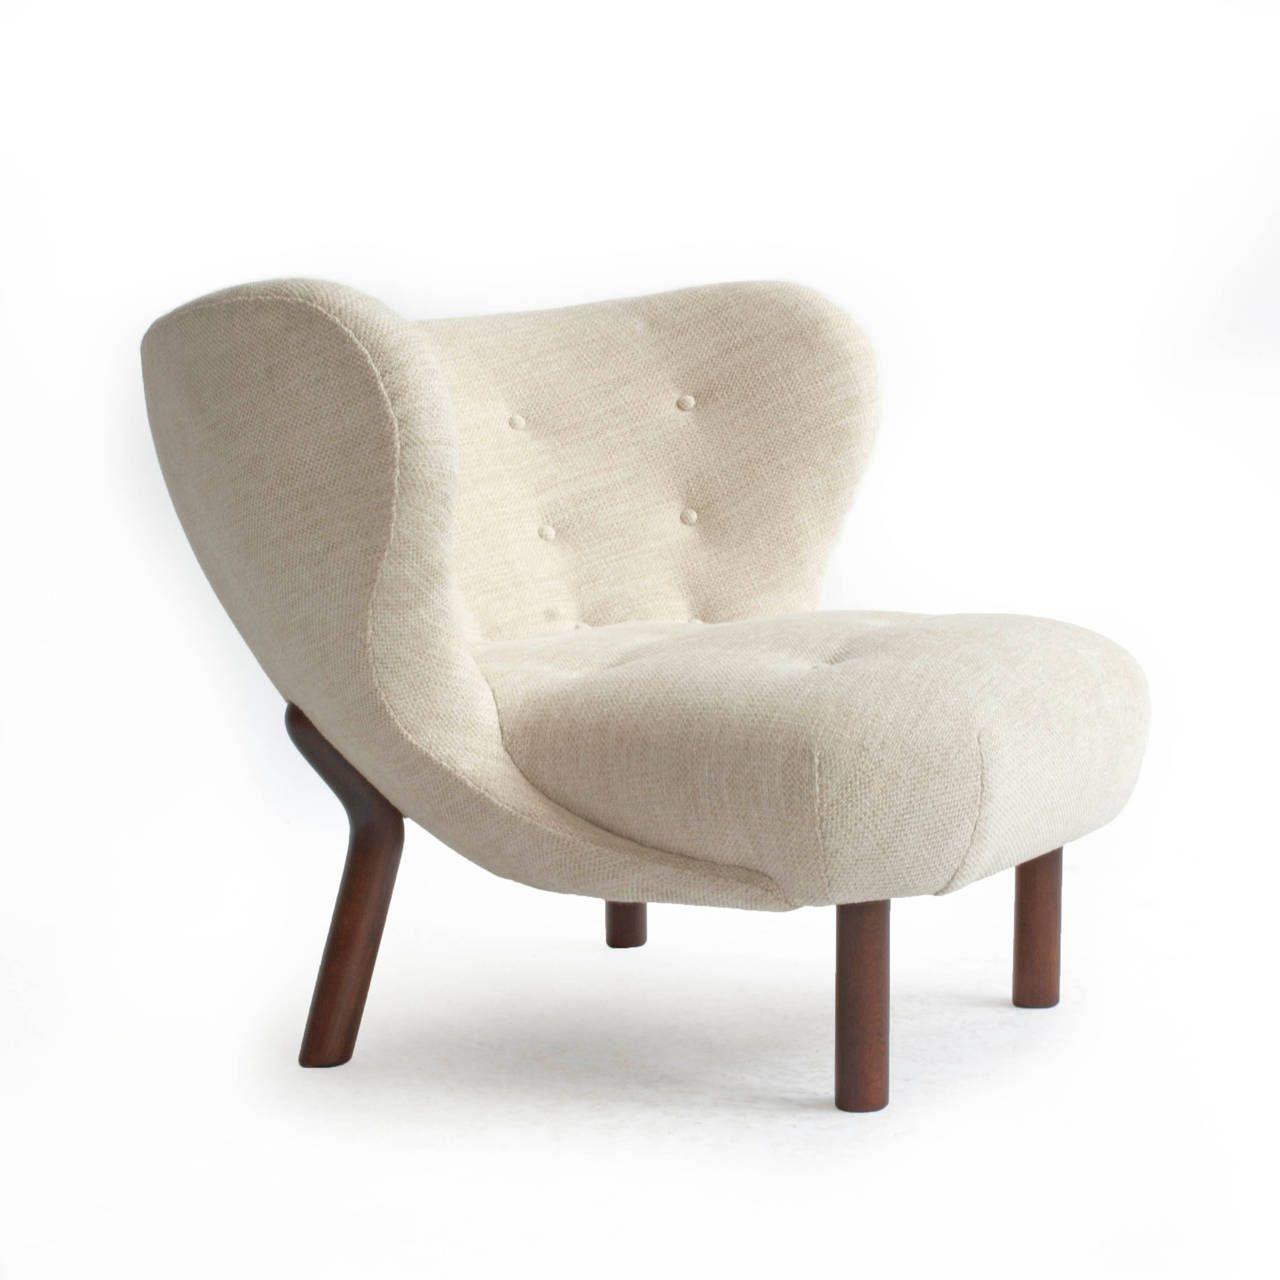 Viggo Boesen The Little Petra Lounge Chair A J Iversen Furniture Modern Lounge Chairs Chair